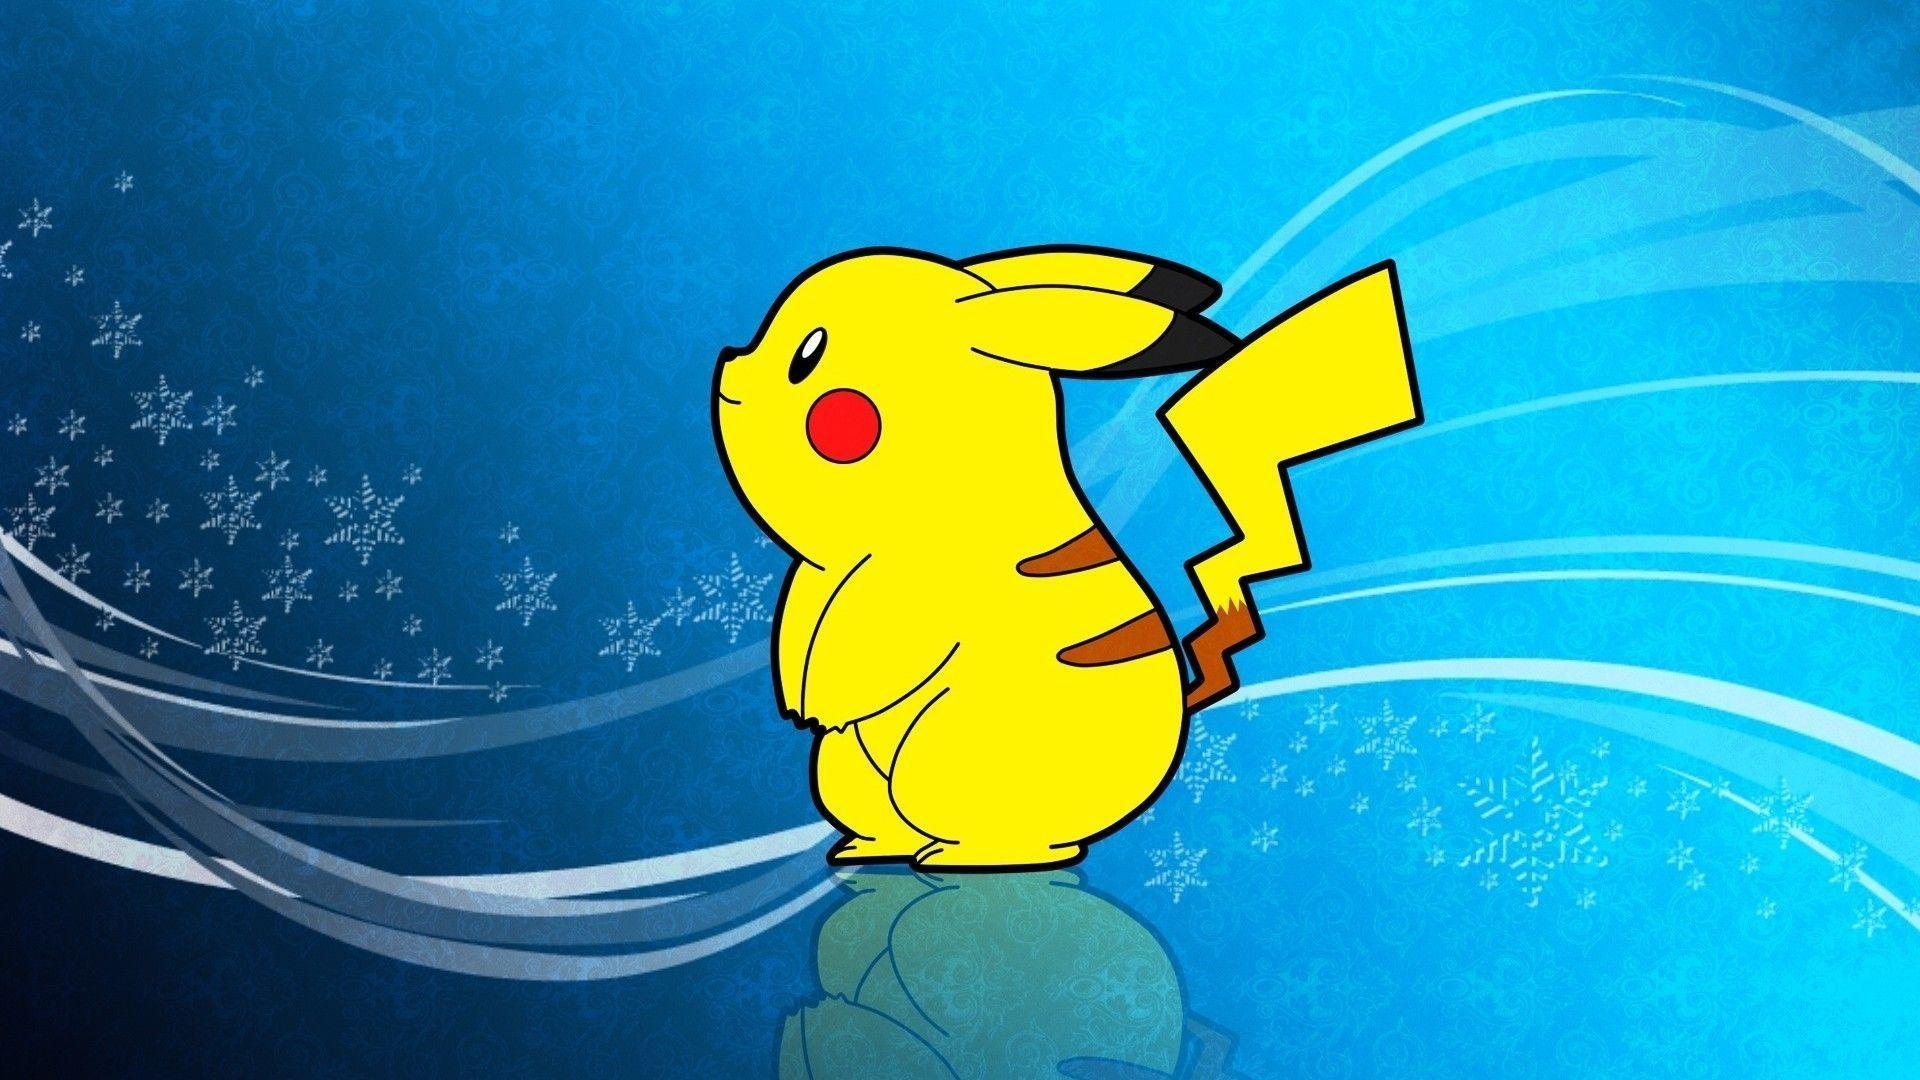 Pokemon christmas backgroundFree Download HD Wallpapers | Free .